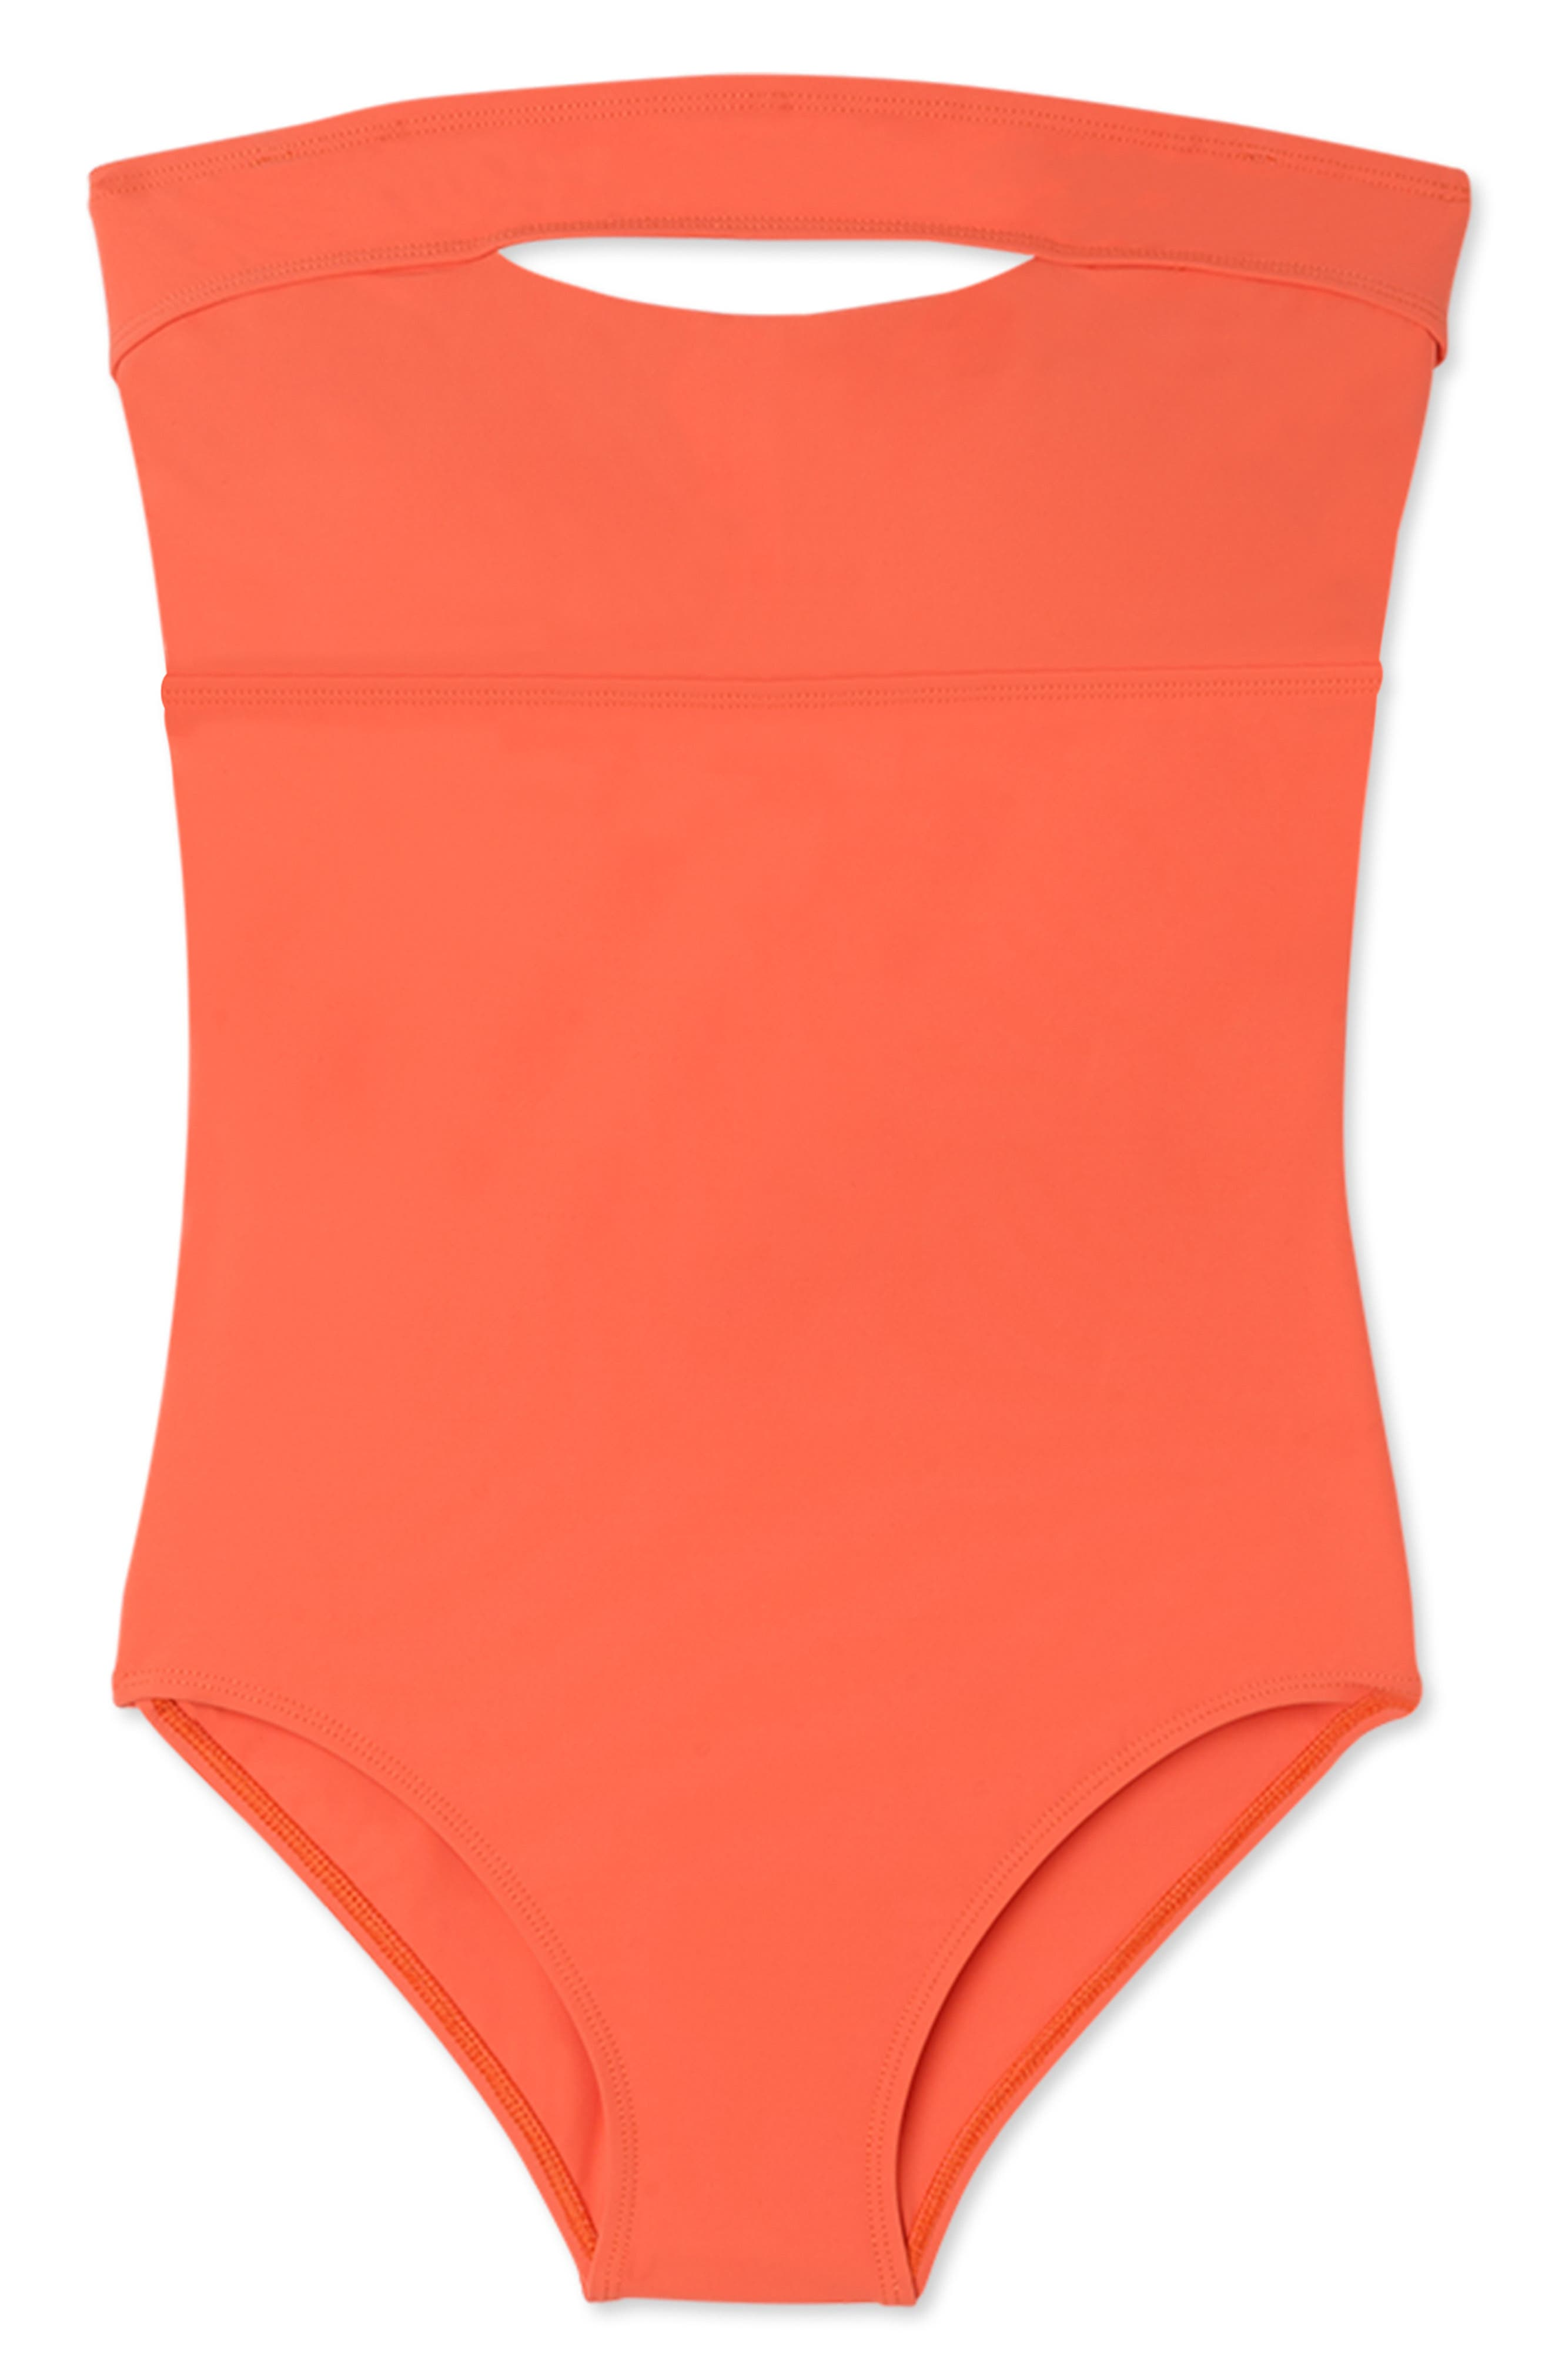 FLAGPOLE Gemma Underwire One-Piece Swimsuit in Papaya